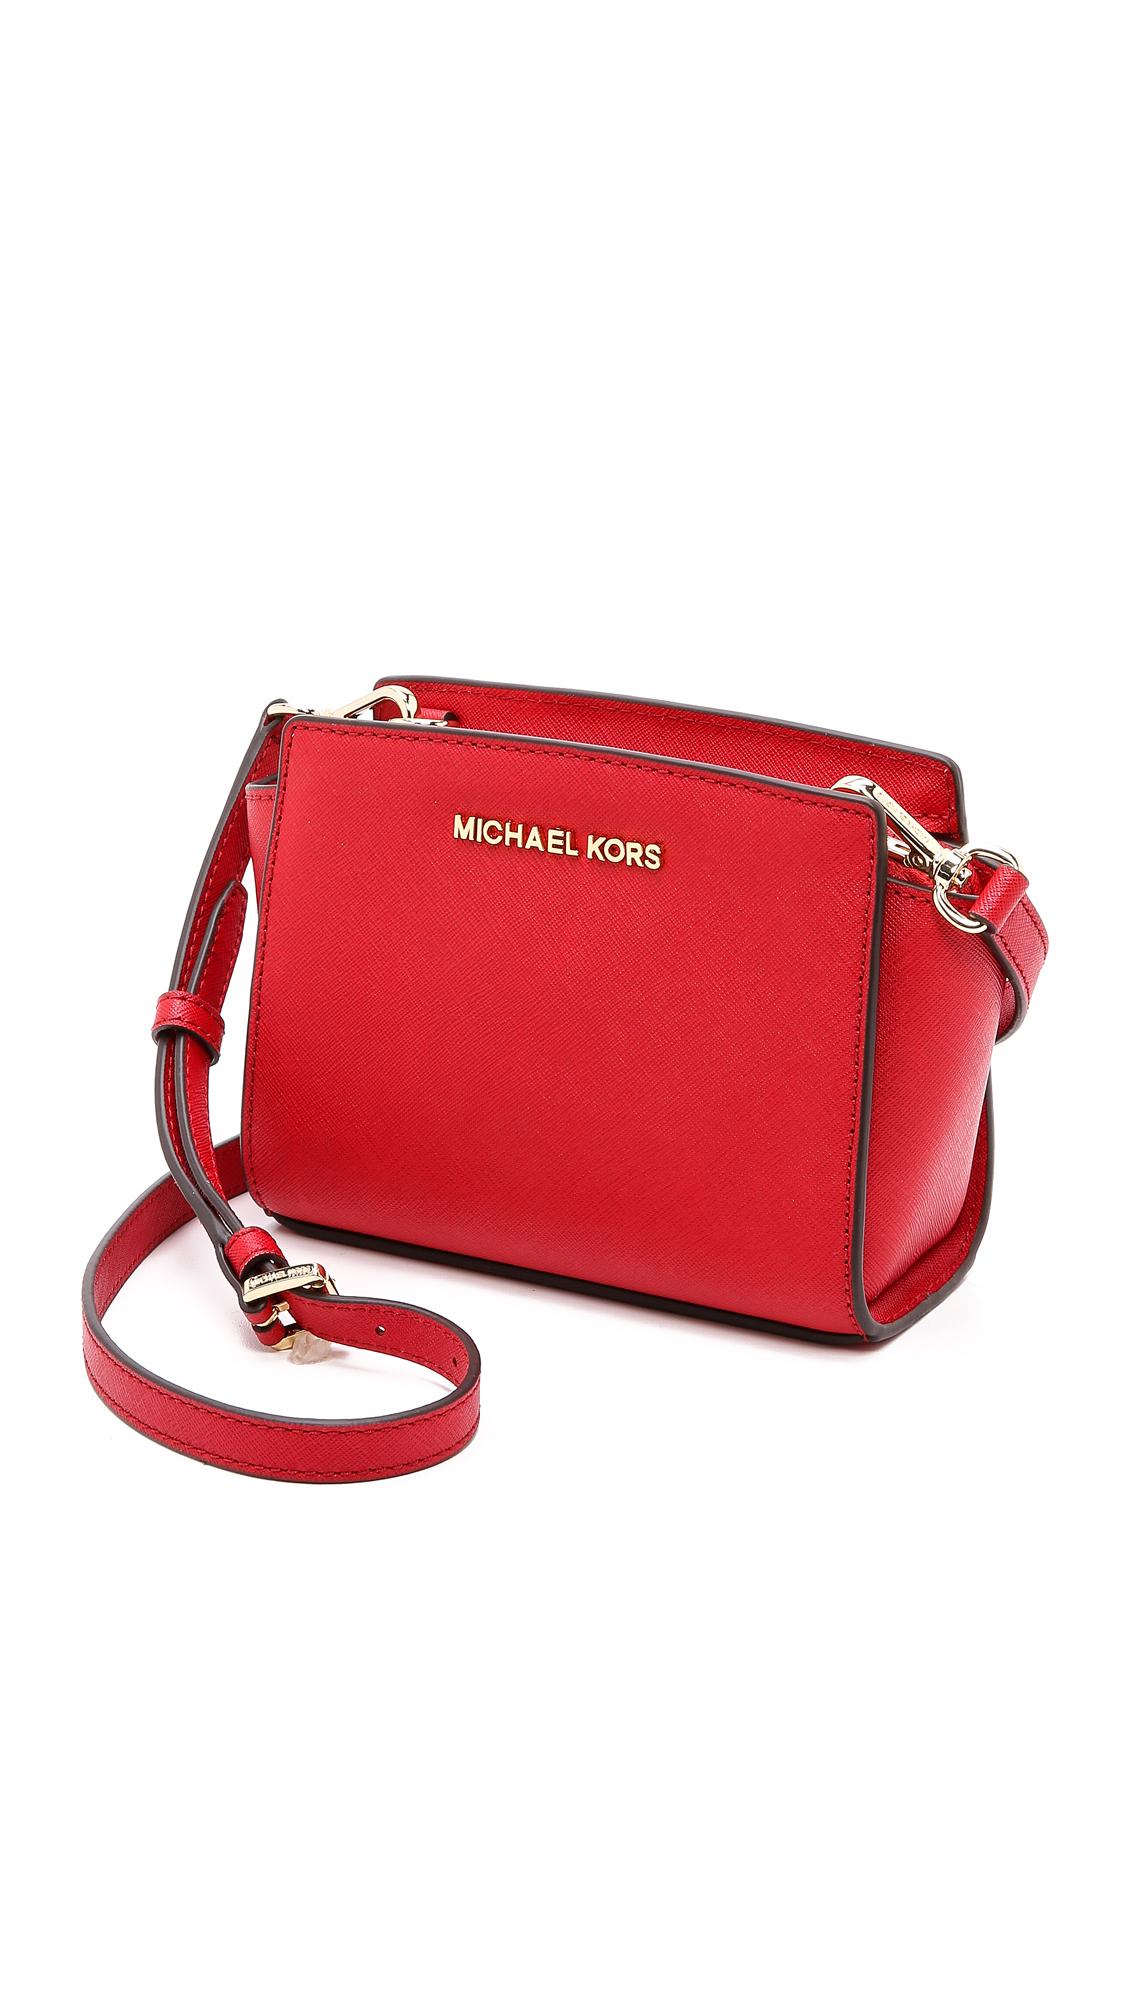 a54fa1e13b75 ... purchase michael michael kors selma mini messenger bag pale pink in red  lyst 3cc33 9561b